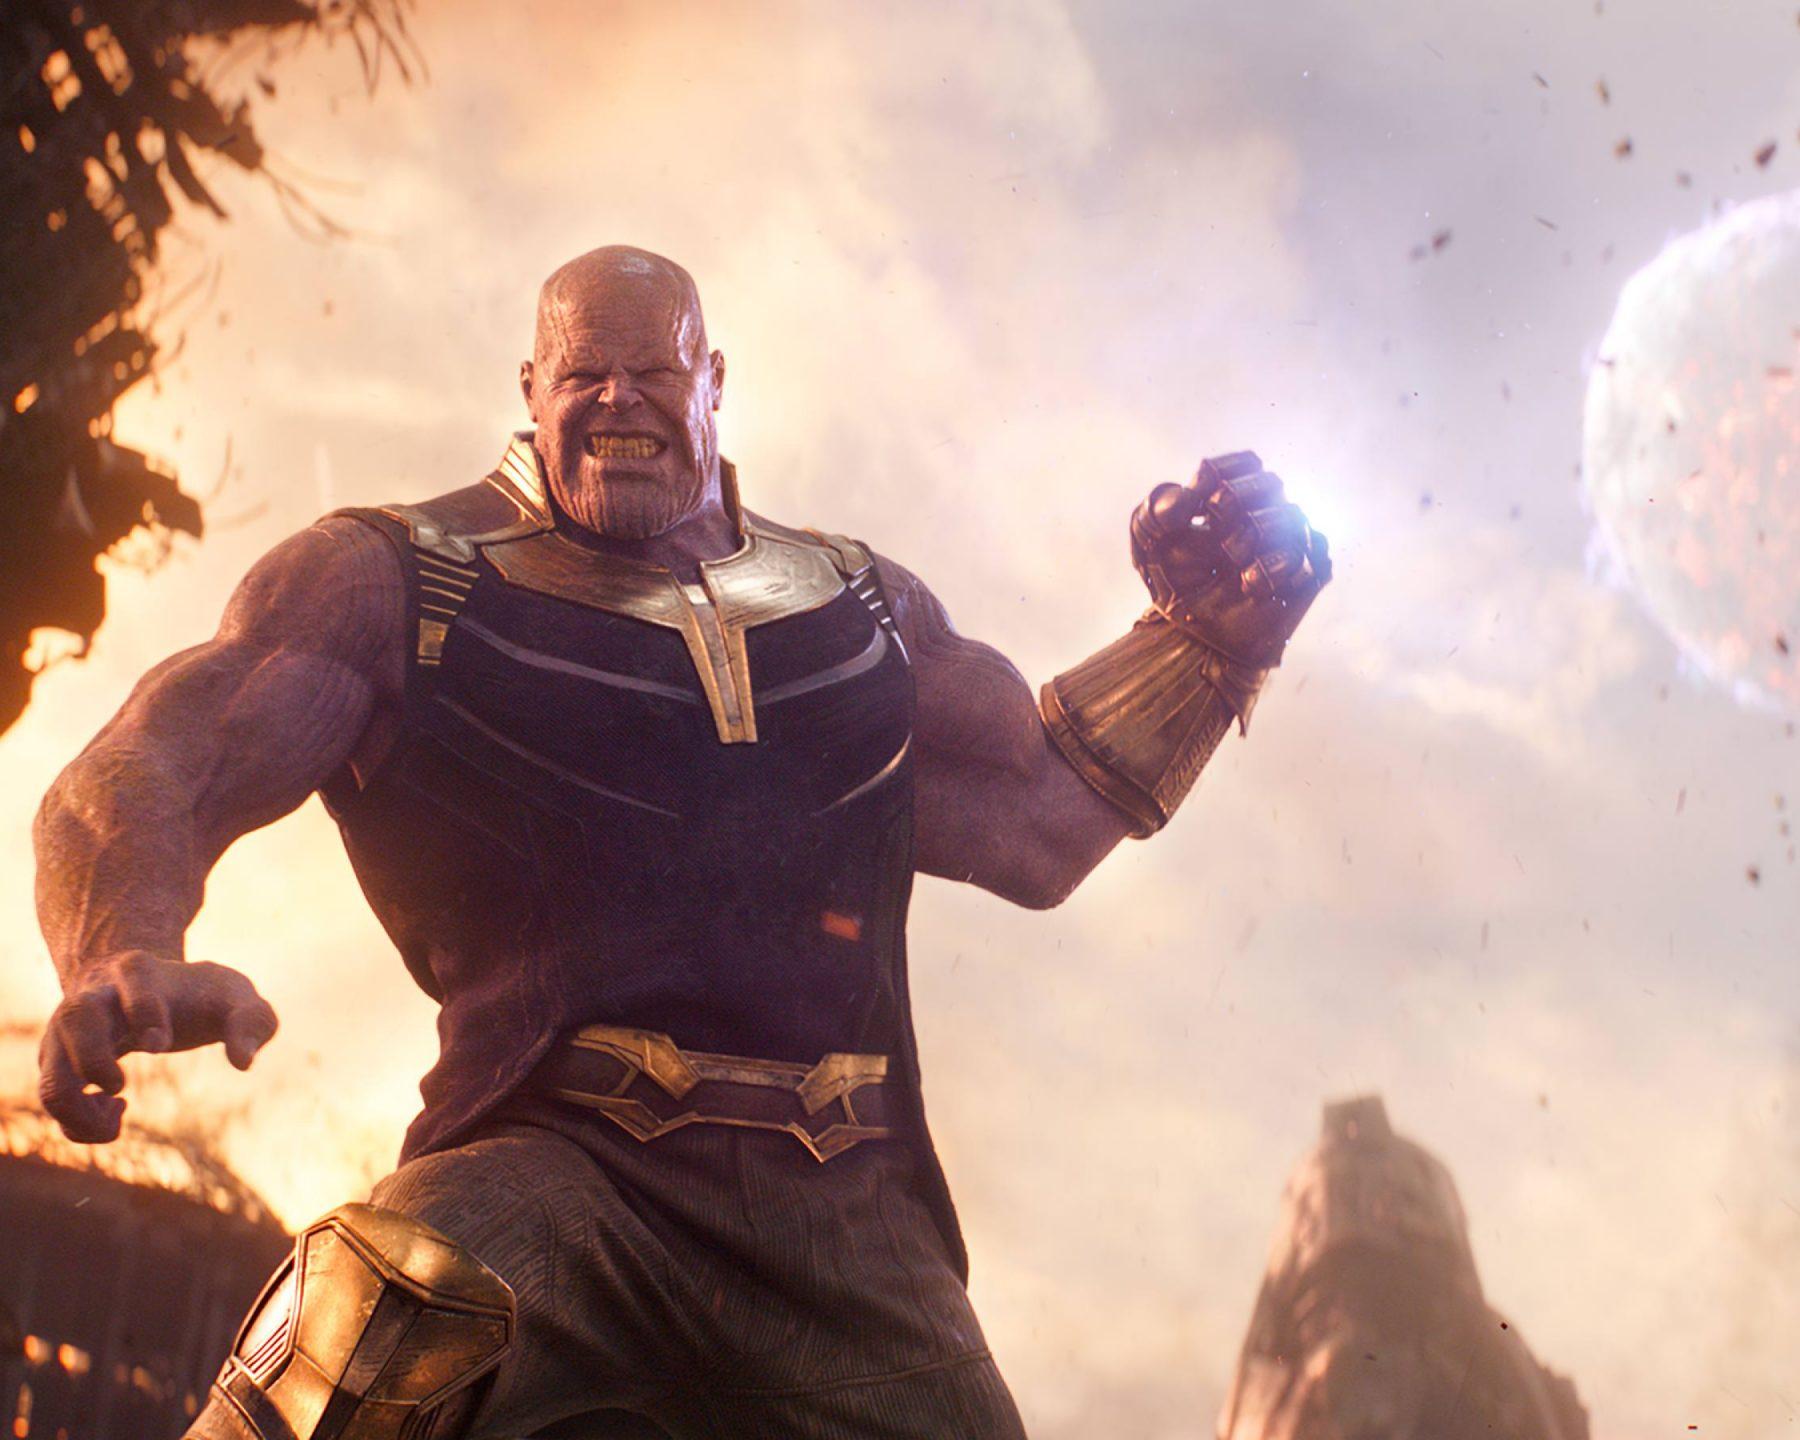 Avengers Infinity War 2018 Thanos 4k Uhd 3 2 3840x2560: Avengers: Infinity War (2018) Thanos 4K Ultra HD Wallpaper